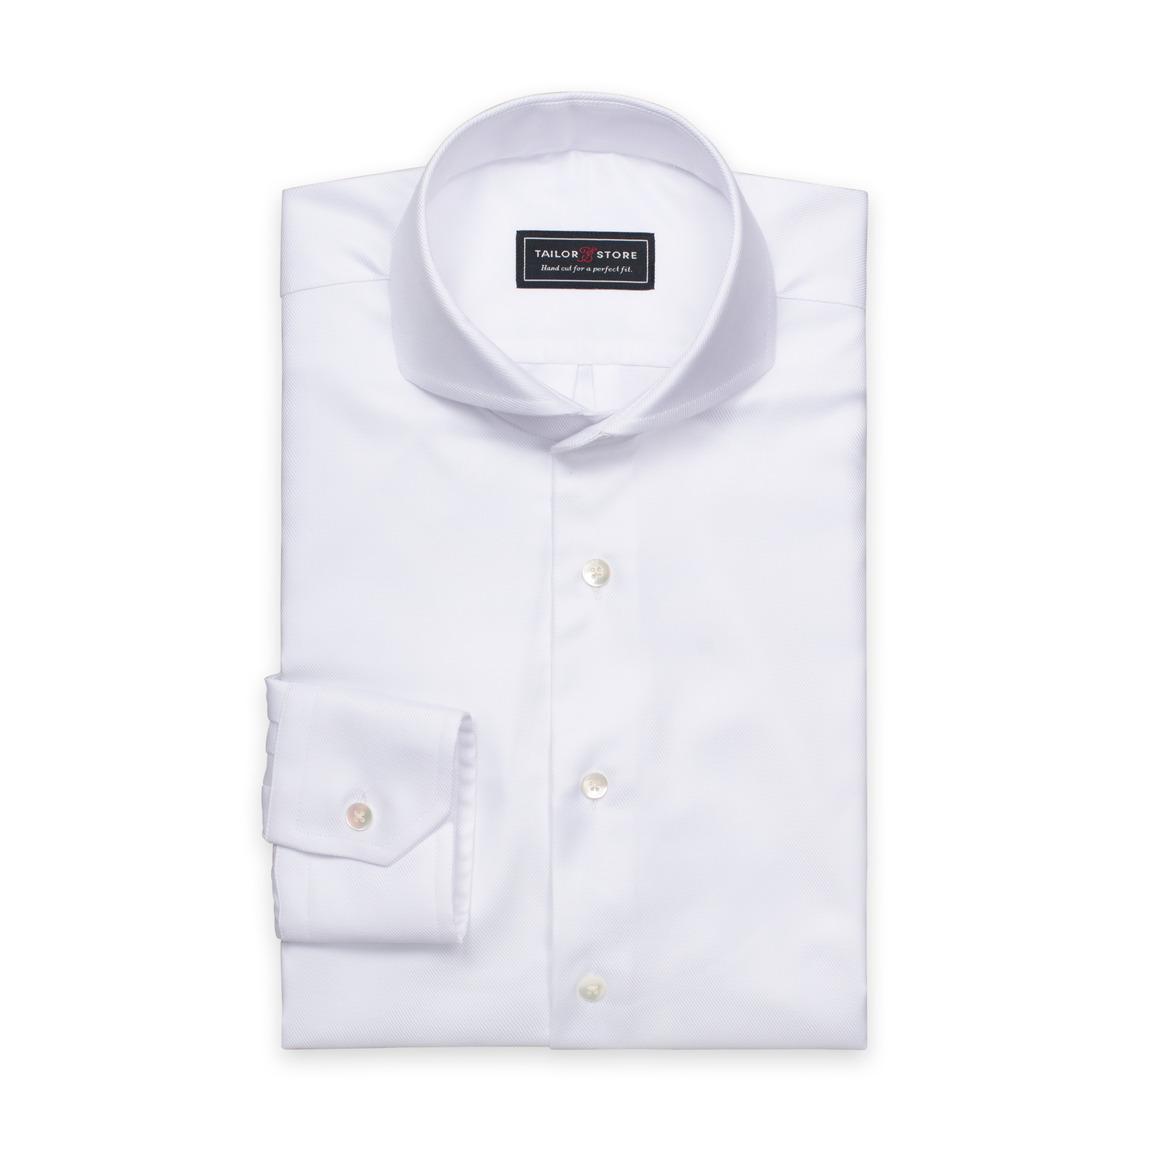 Hvit twillskjorte